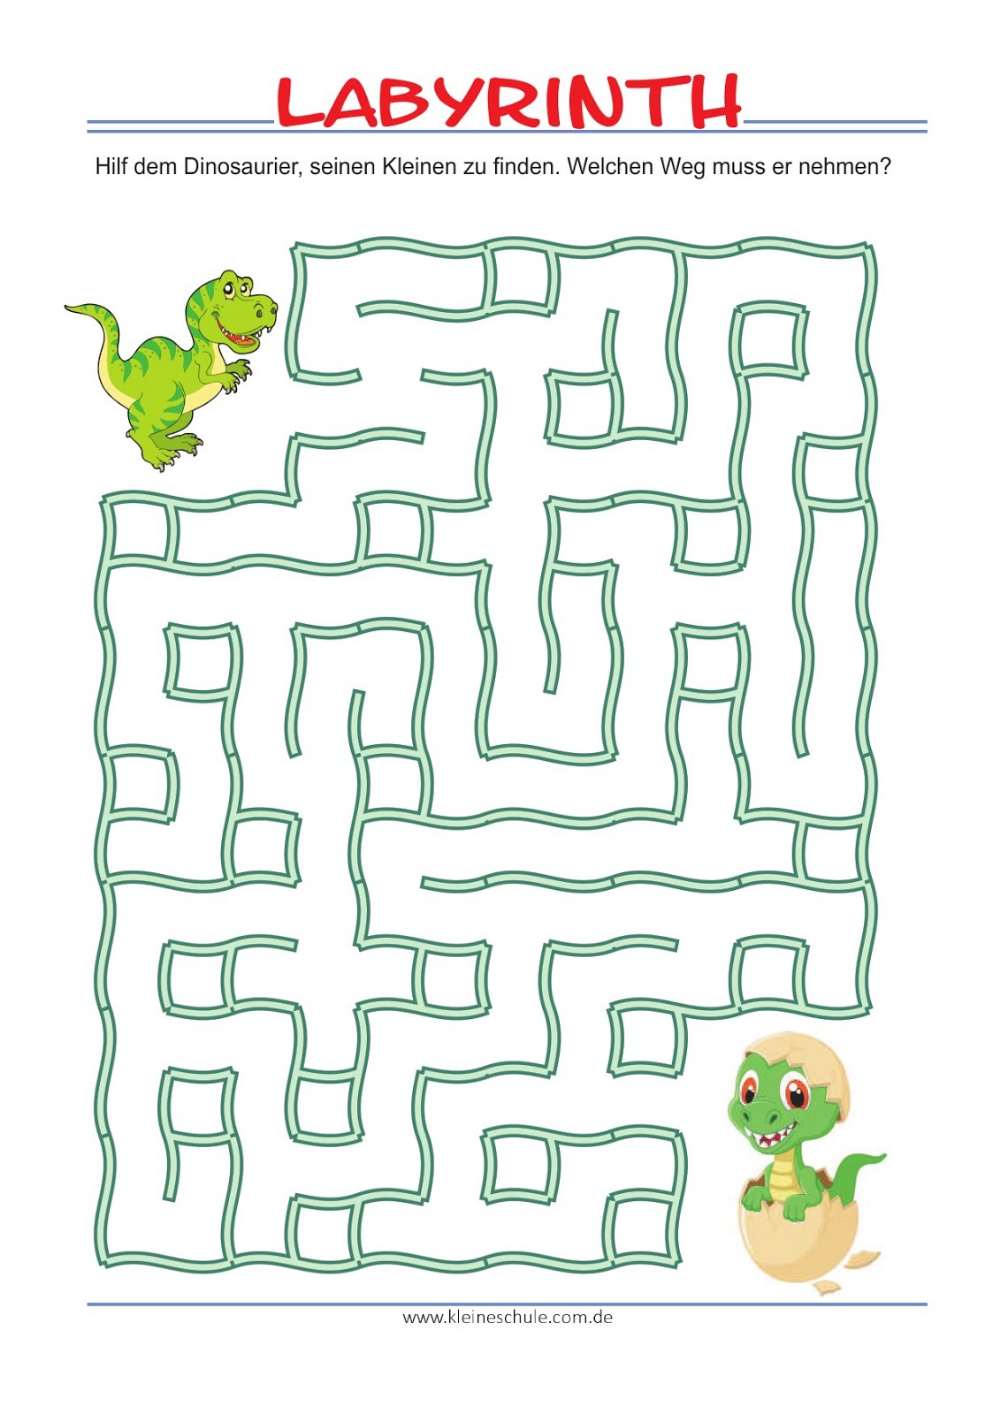 labyrinth maze design for kids ideas 2019  mazes for kids